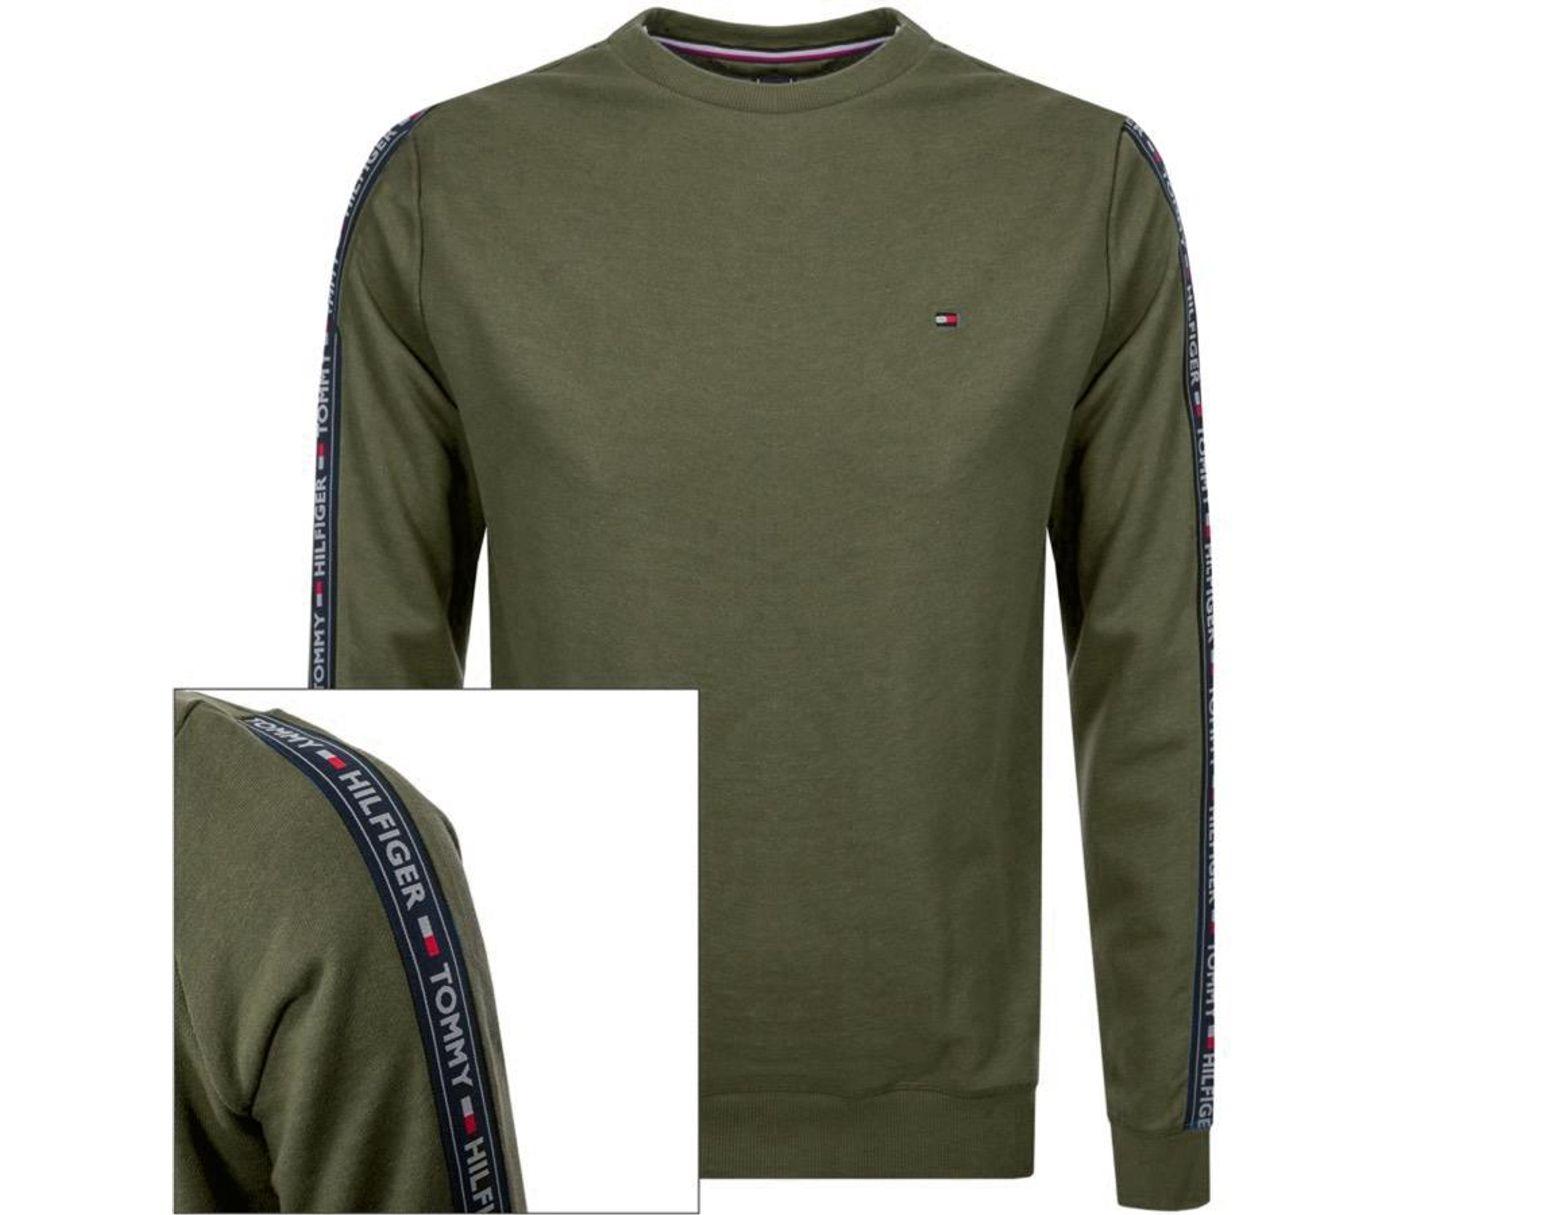 Adidas Originals Black And White Tnt Tape Sweatshirt | Lixnet AG